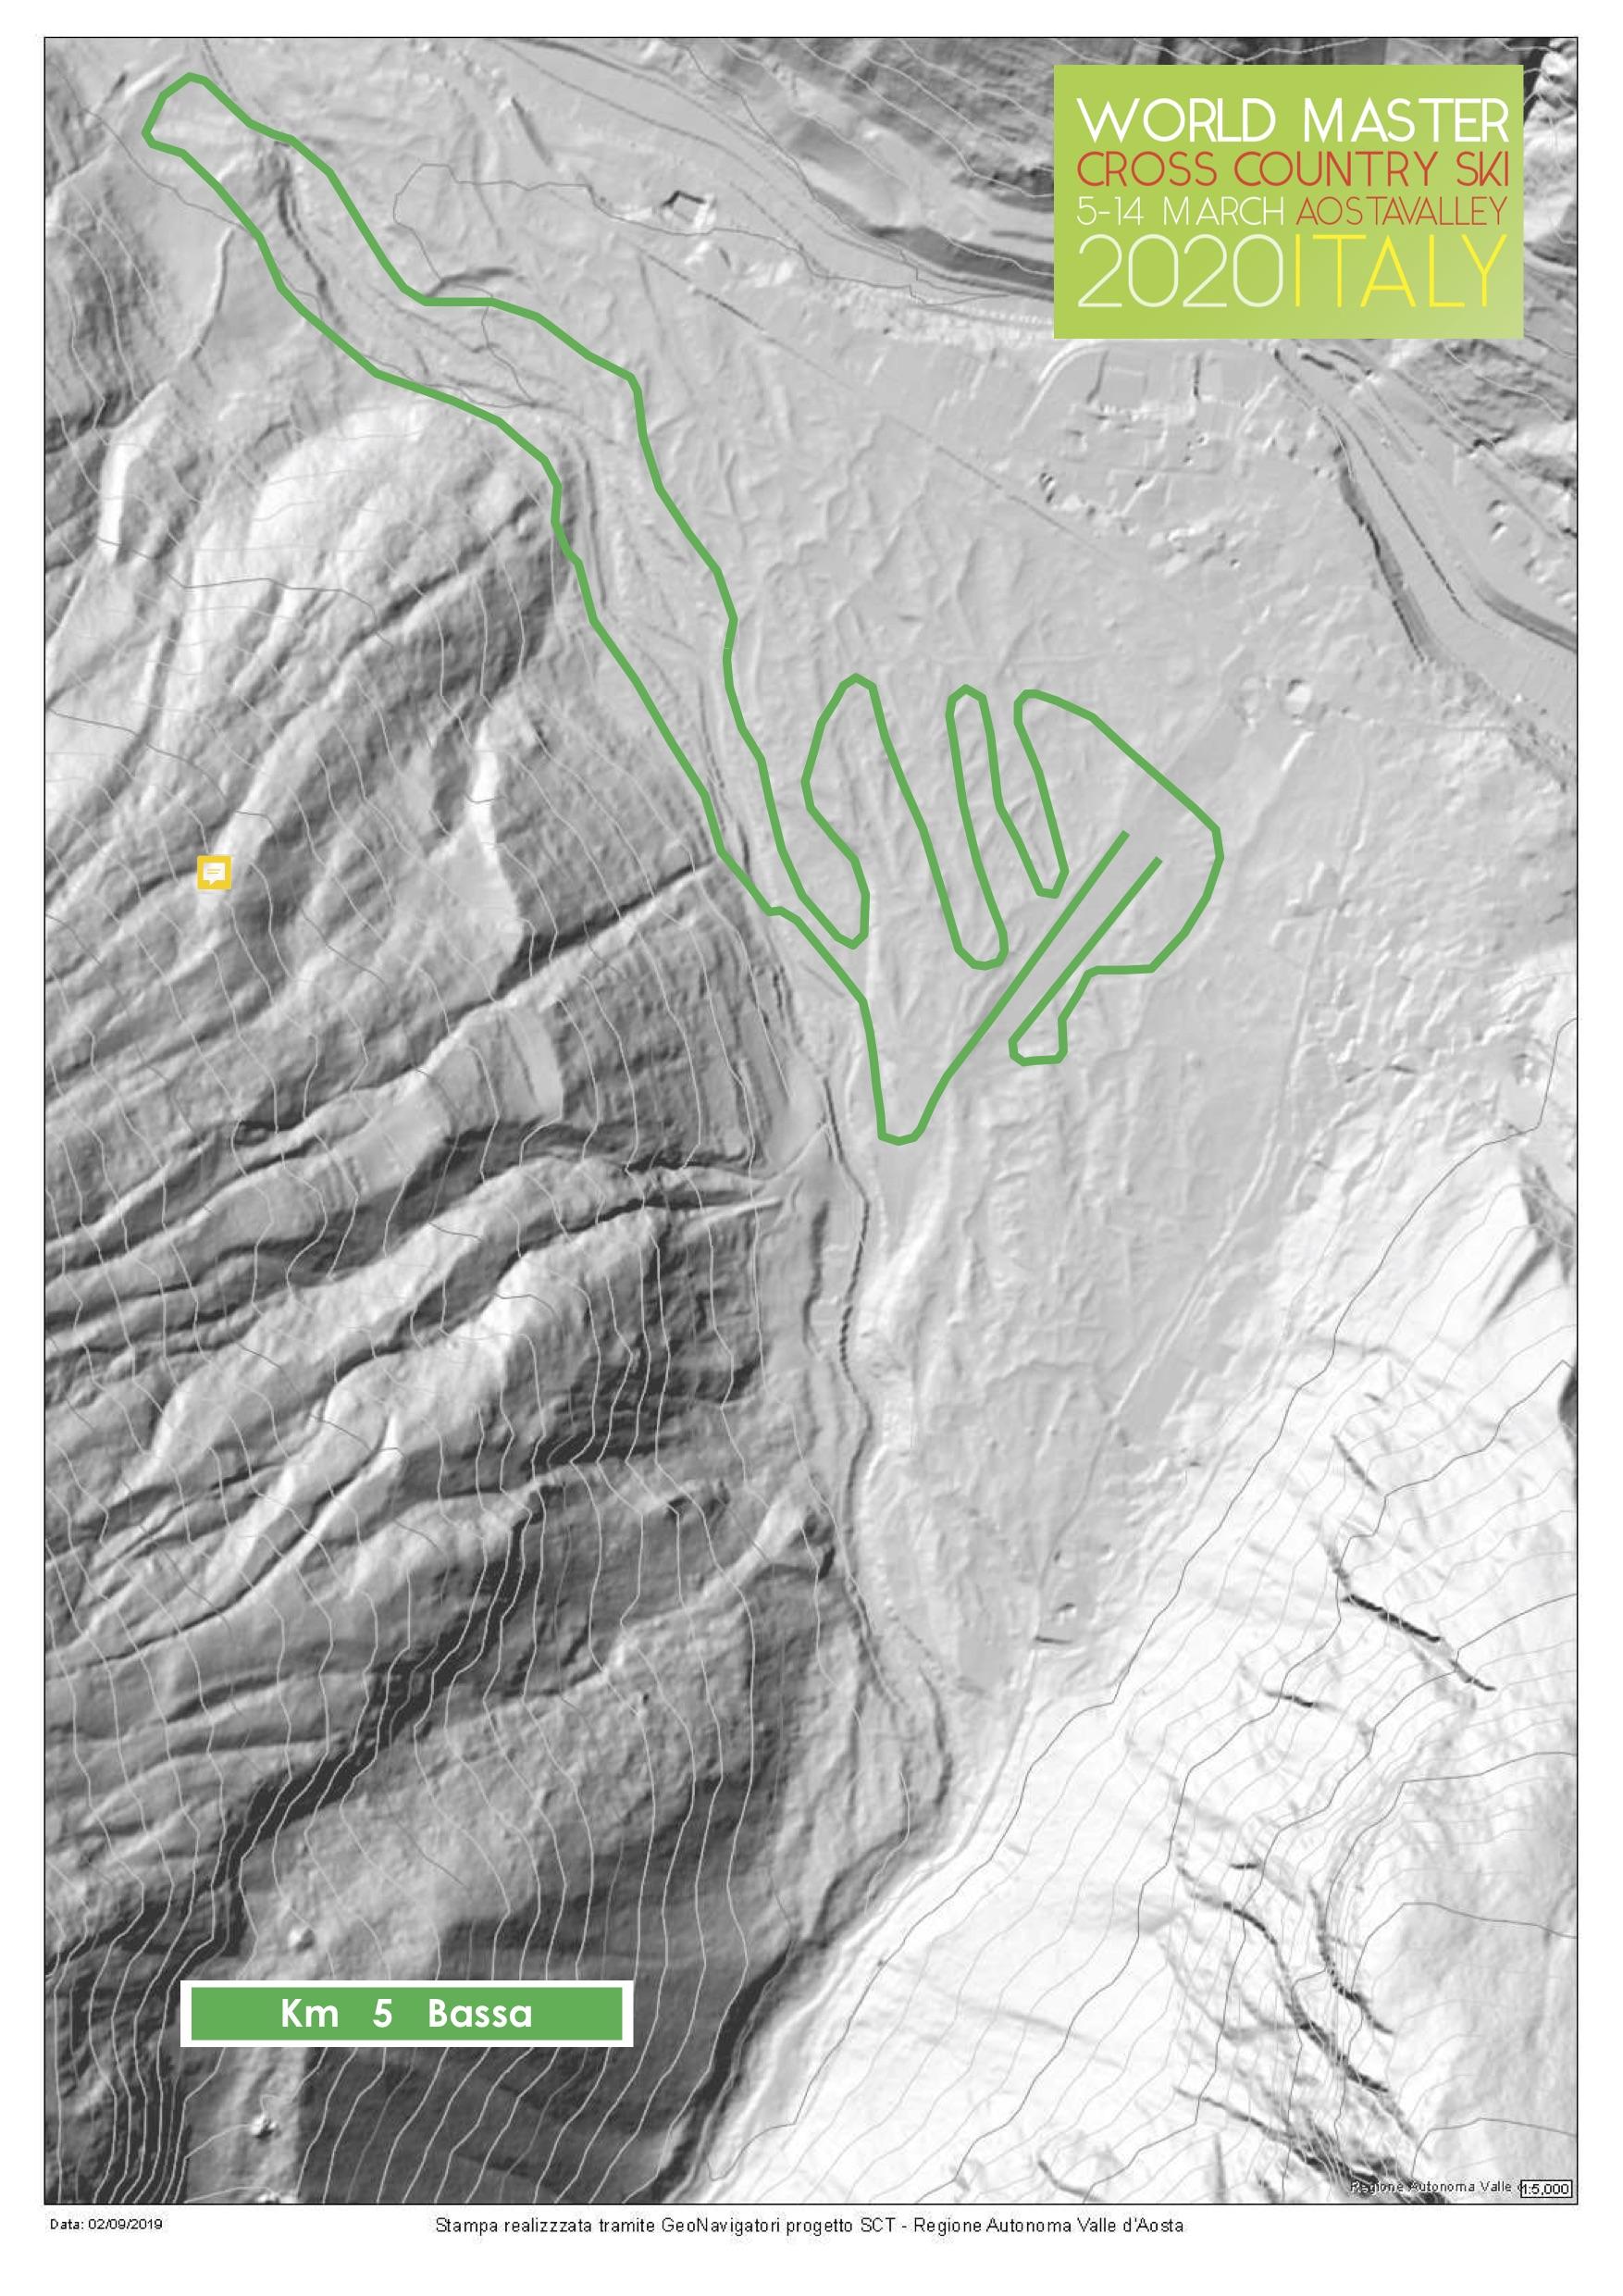 Master World Cup 5km low track ski